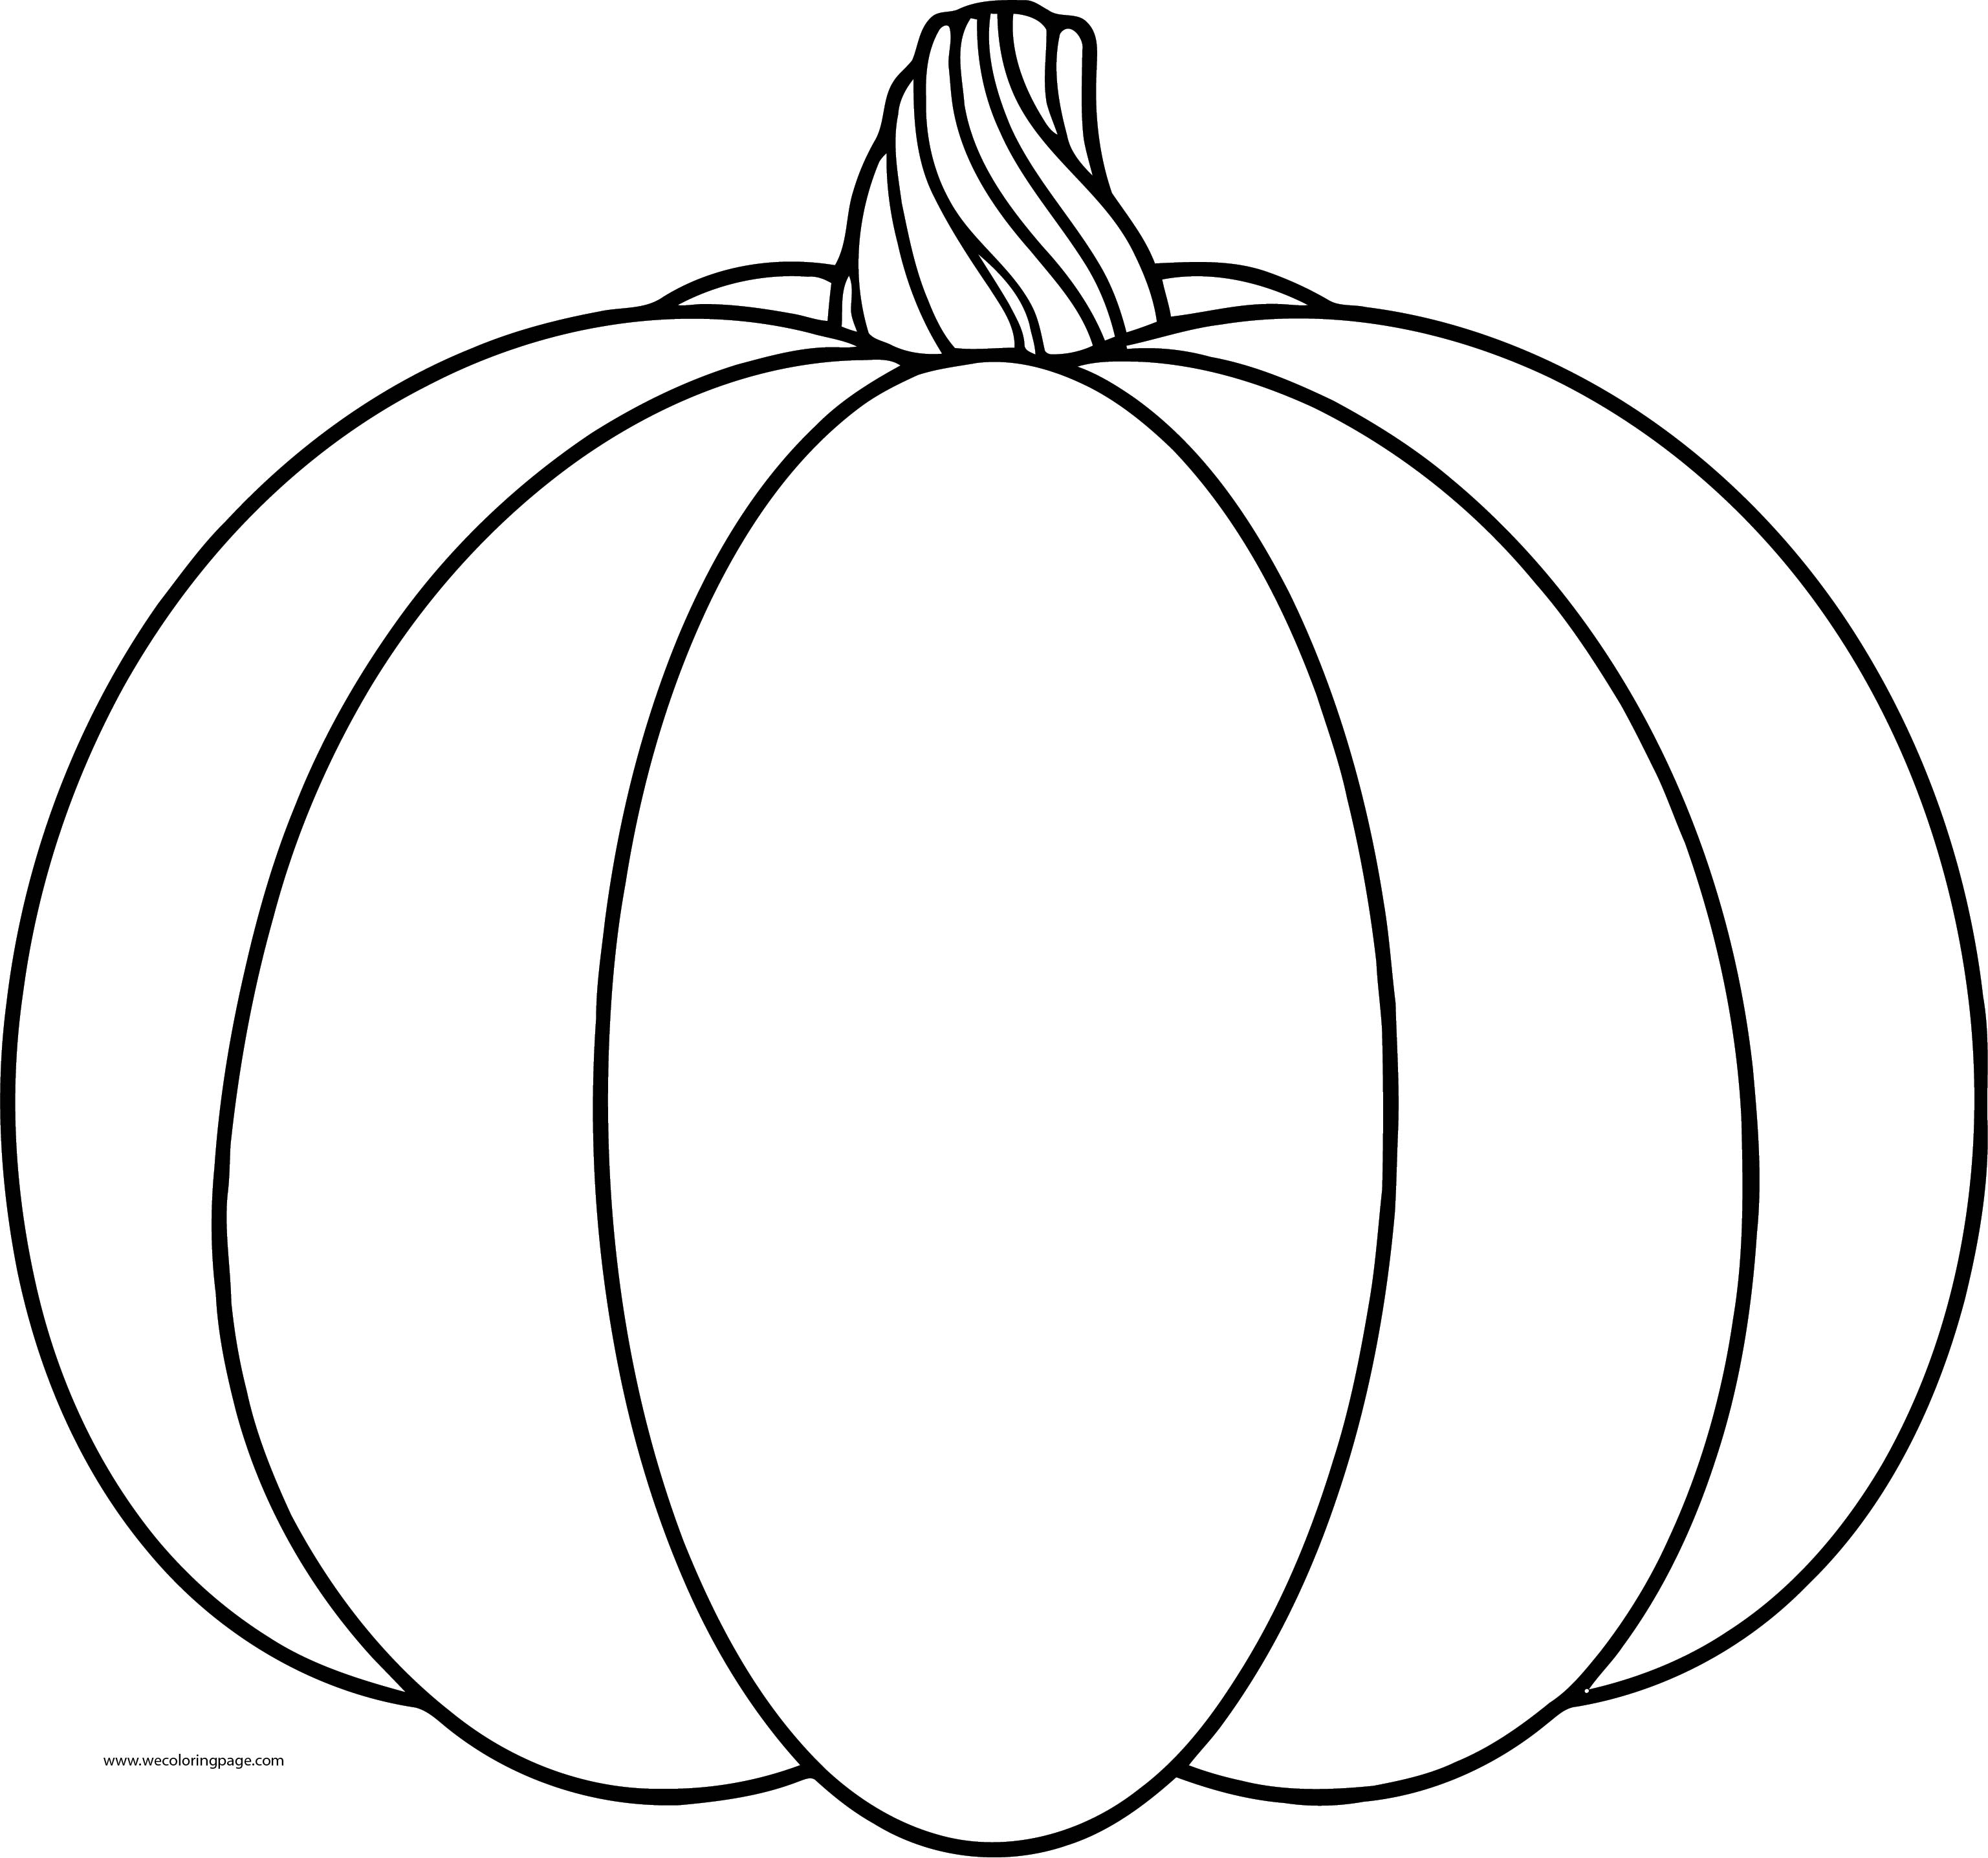 New Fall Pumpkin Coloring Page   Wecoloringpage.com